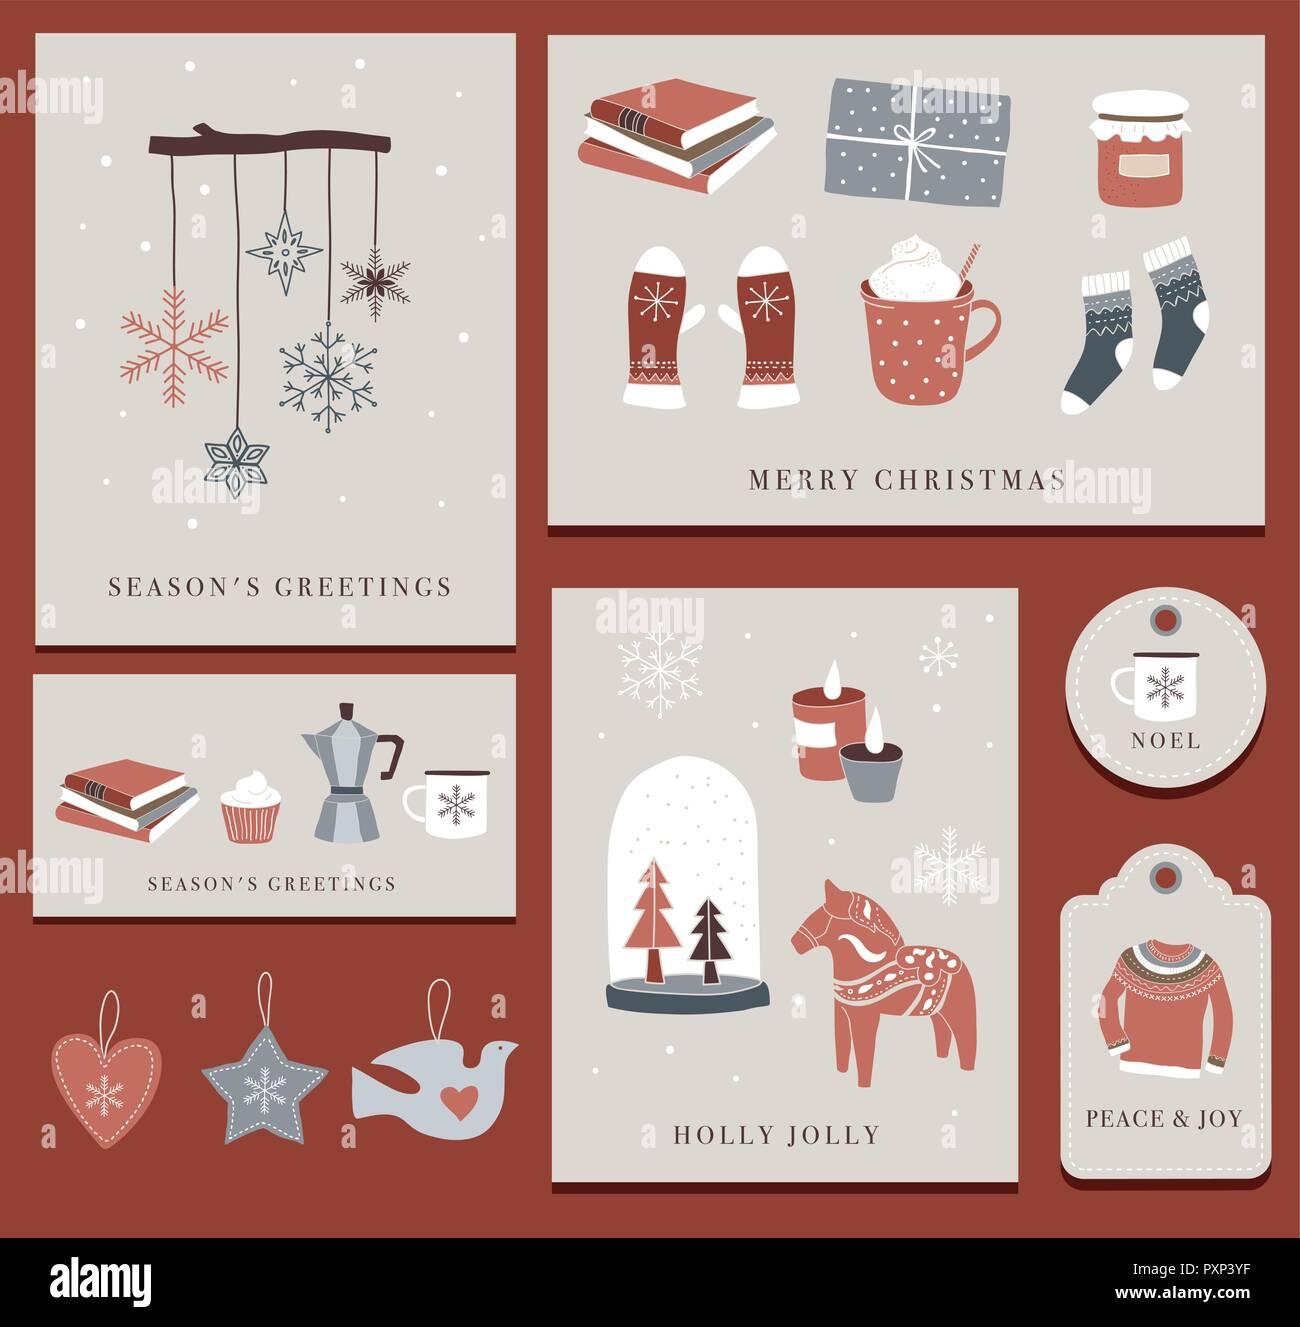 Nordic, Scandinavian winter elements and Hygge concept design, Merry ...